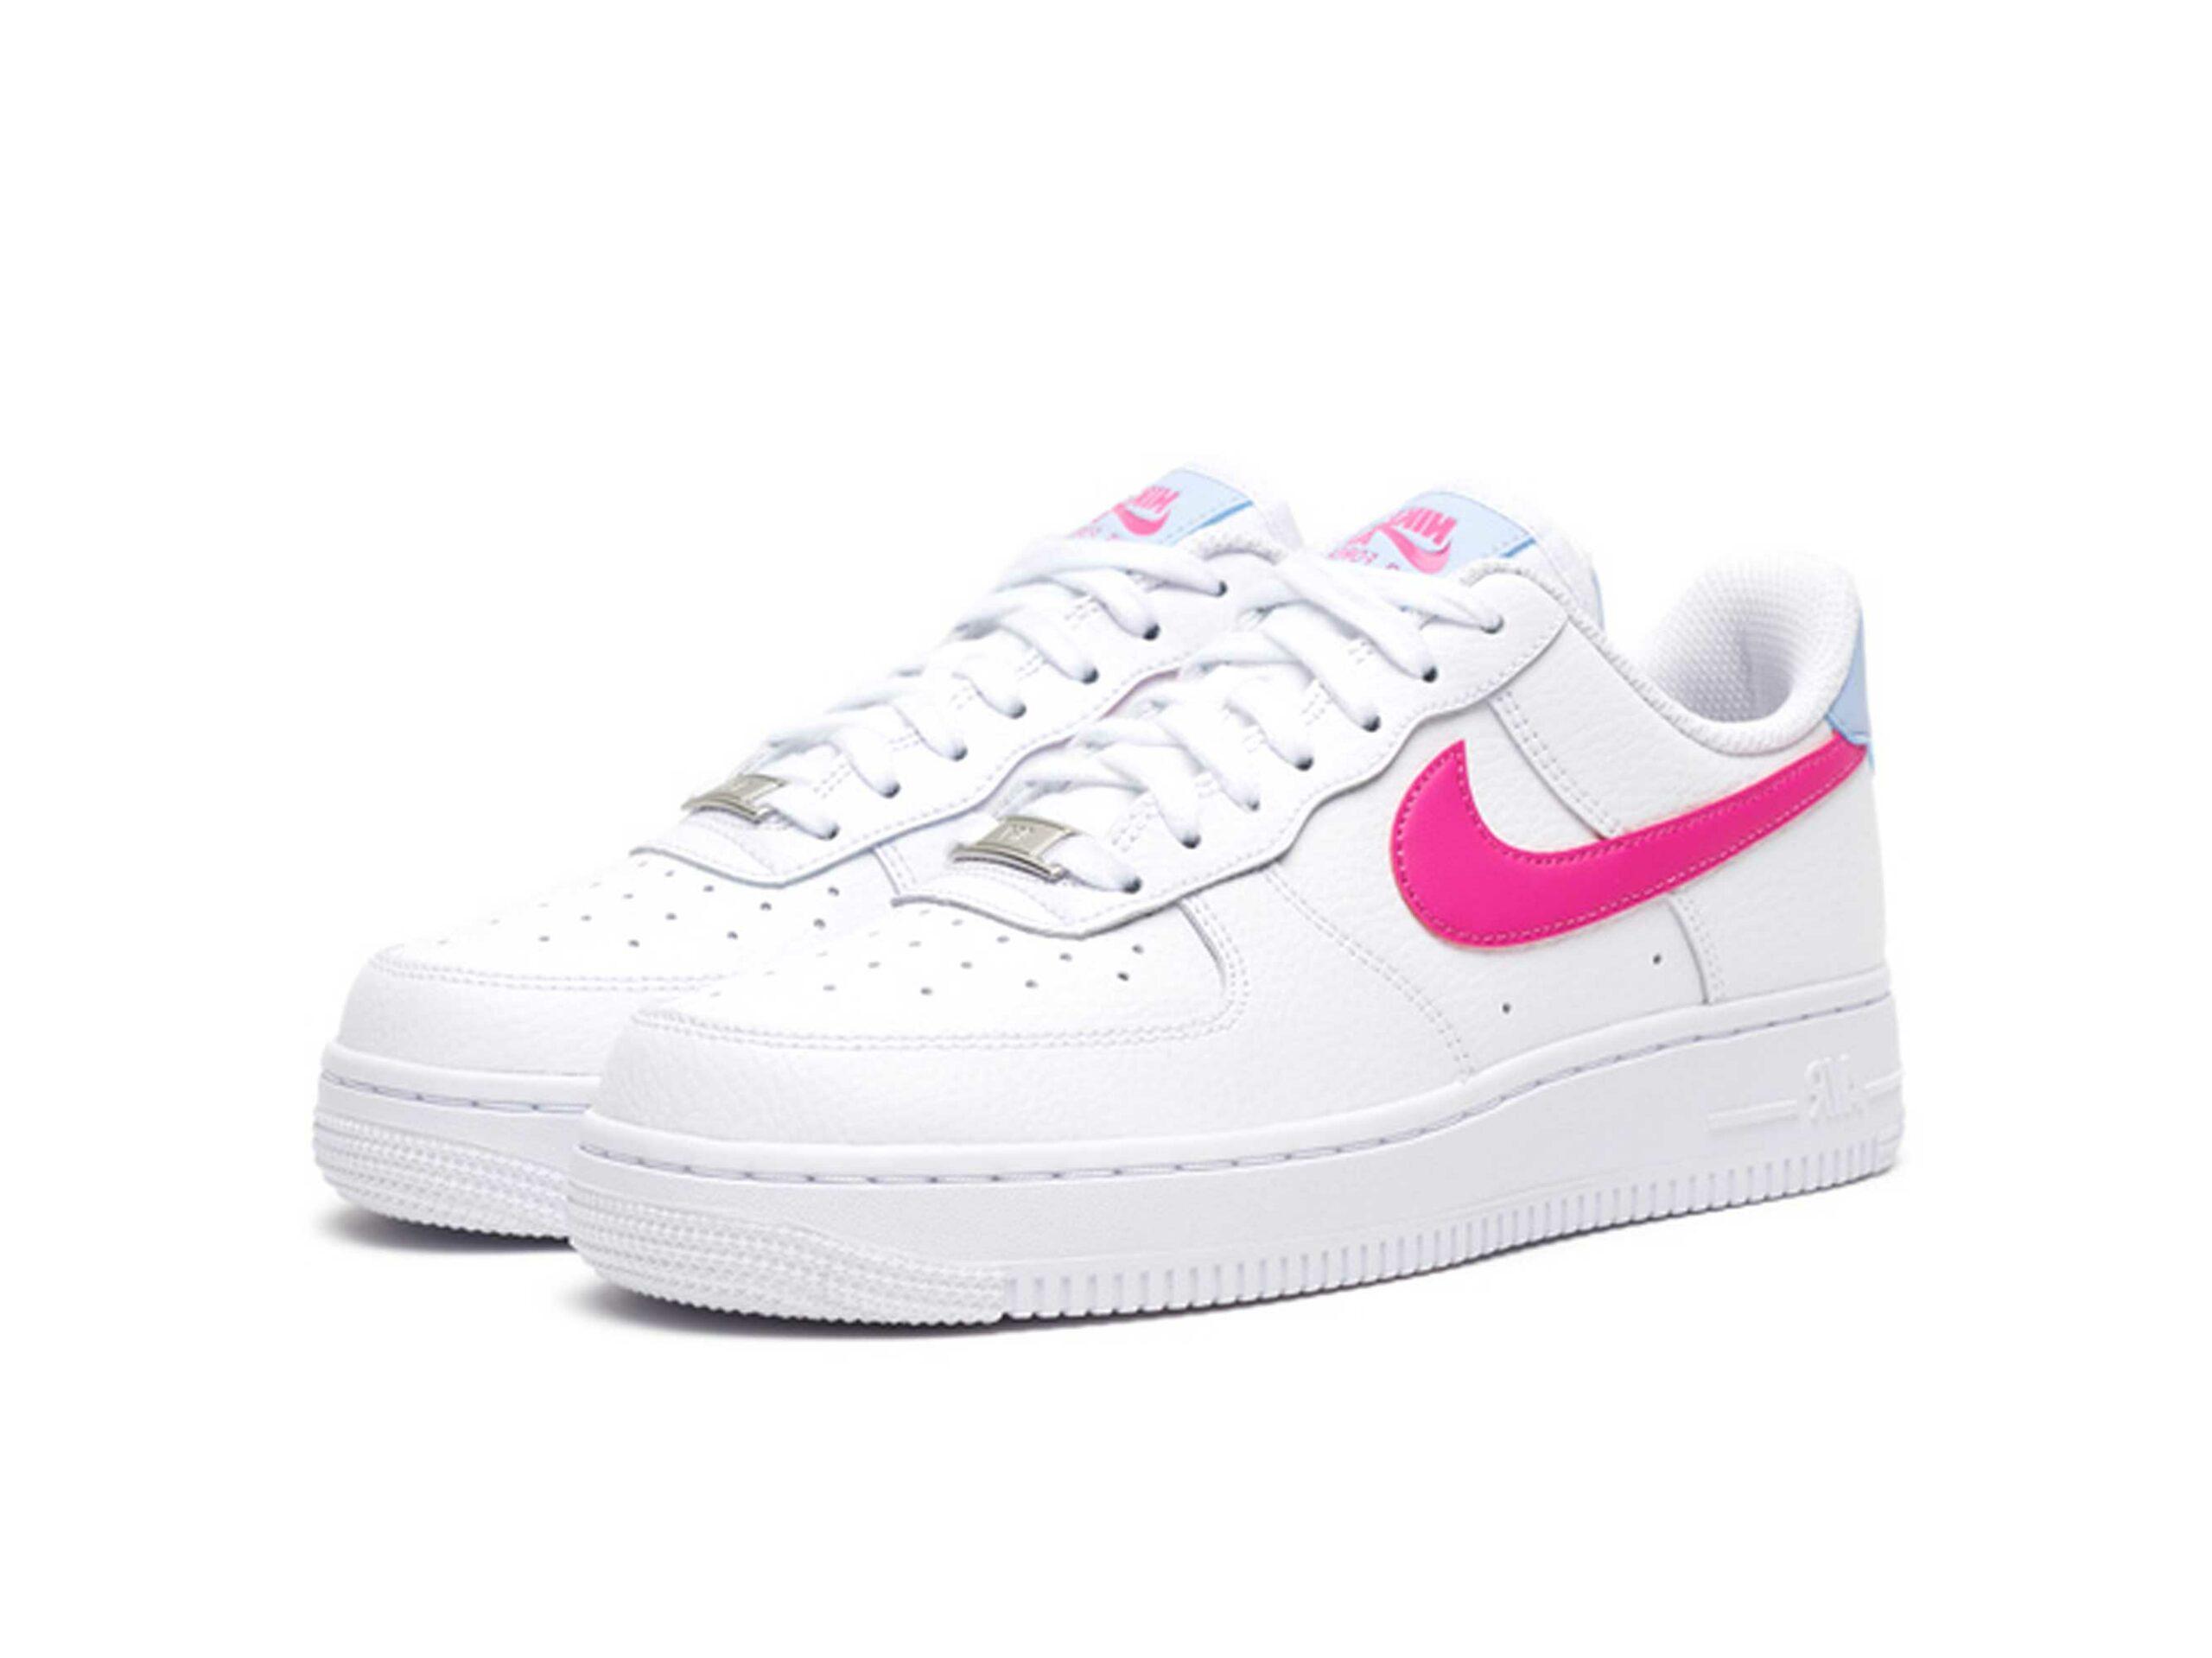 nike air force 1 07 white fire pink CT4328_101 купить